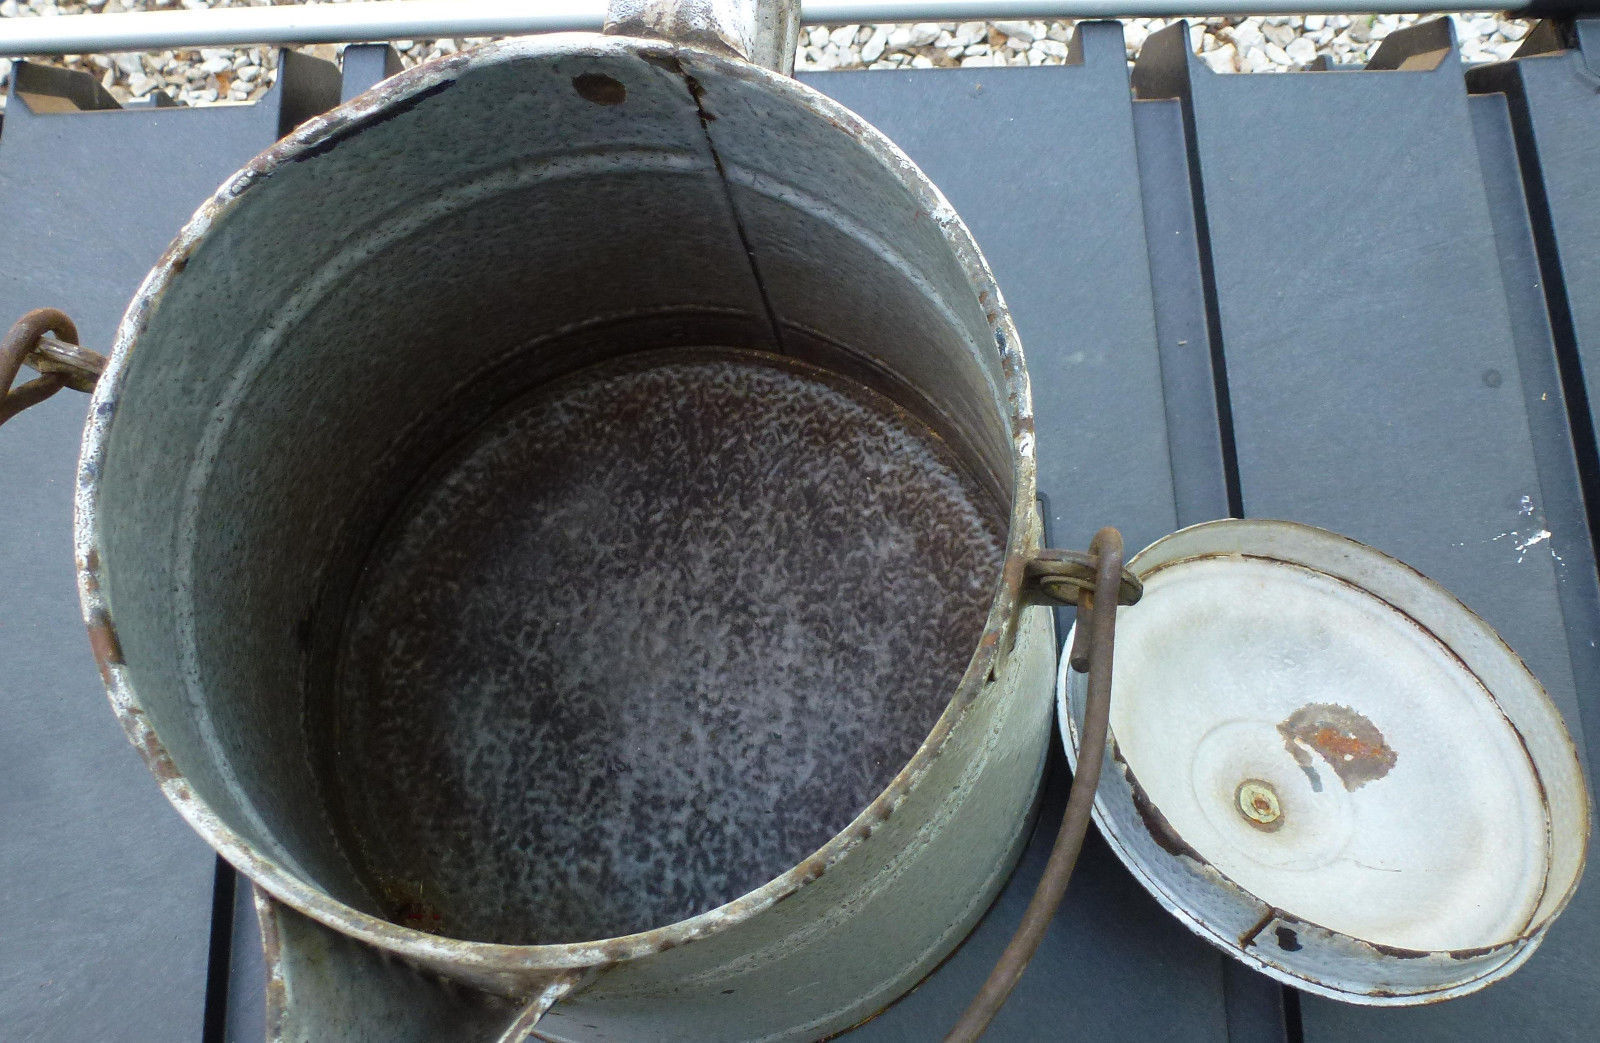 Vintage Gray Enamel Pot hot water coffee teapot kettle granite camp stove fire